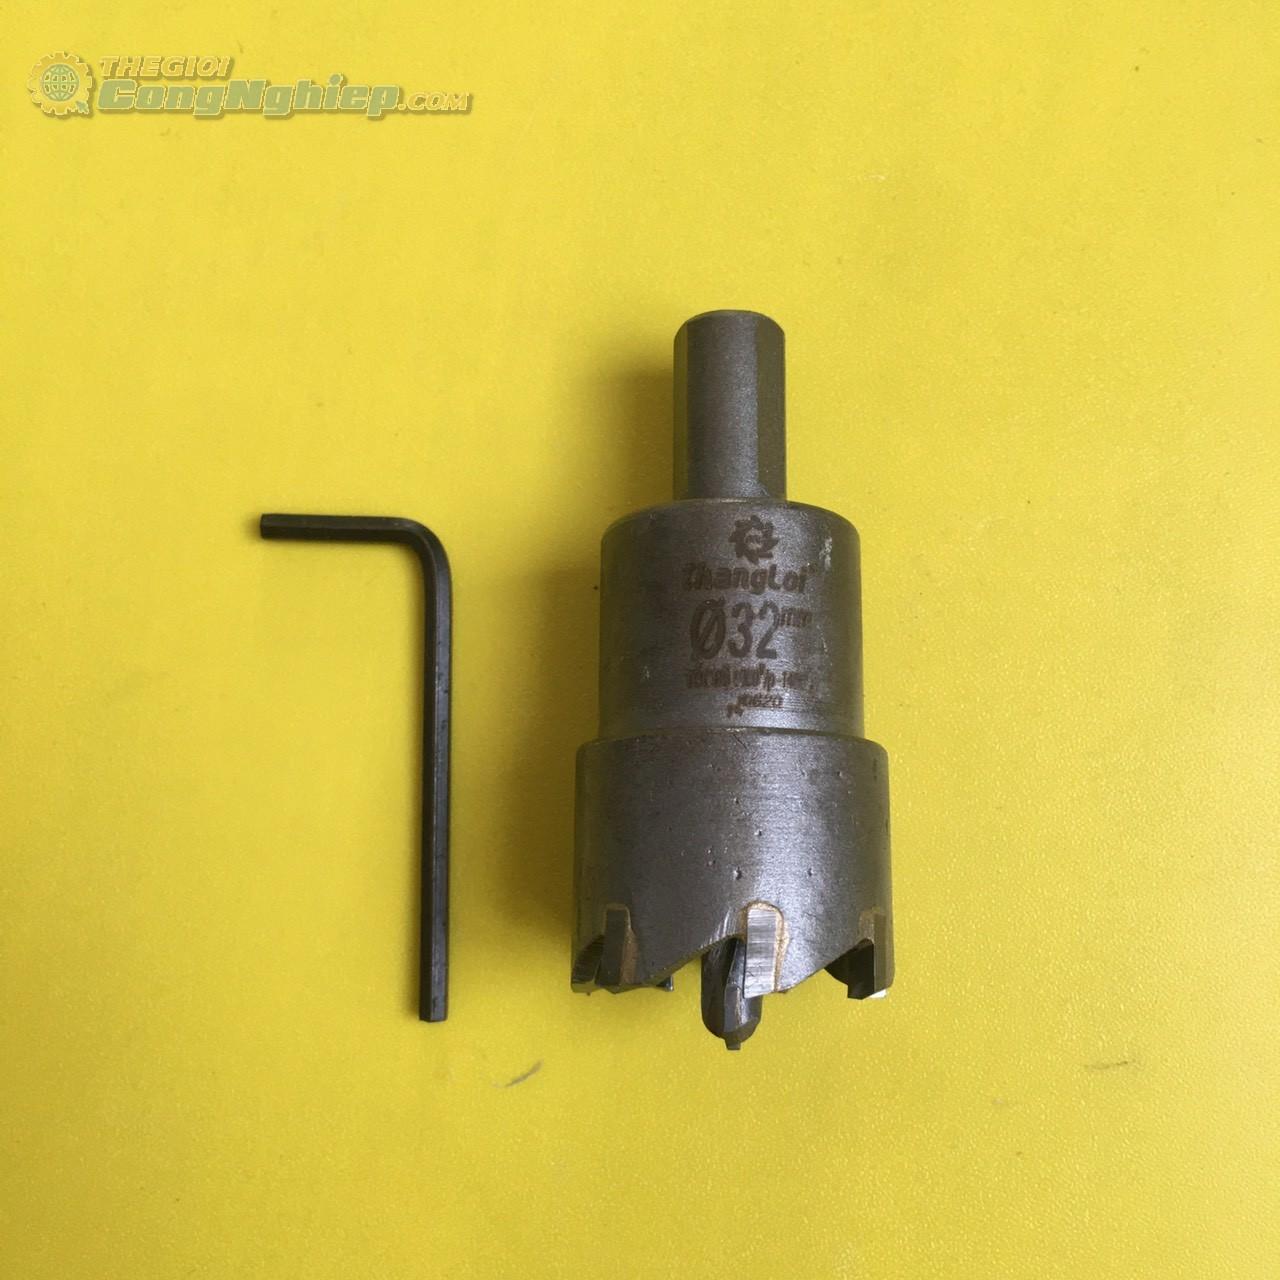 Iron nose TGCN-50537 THANGLOI